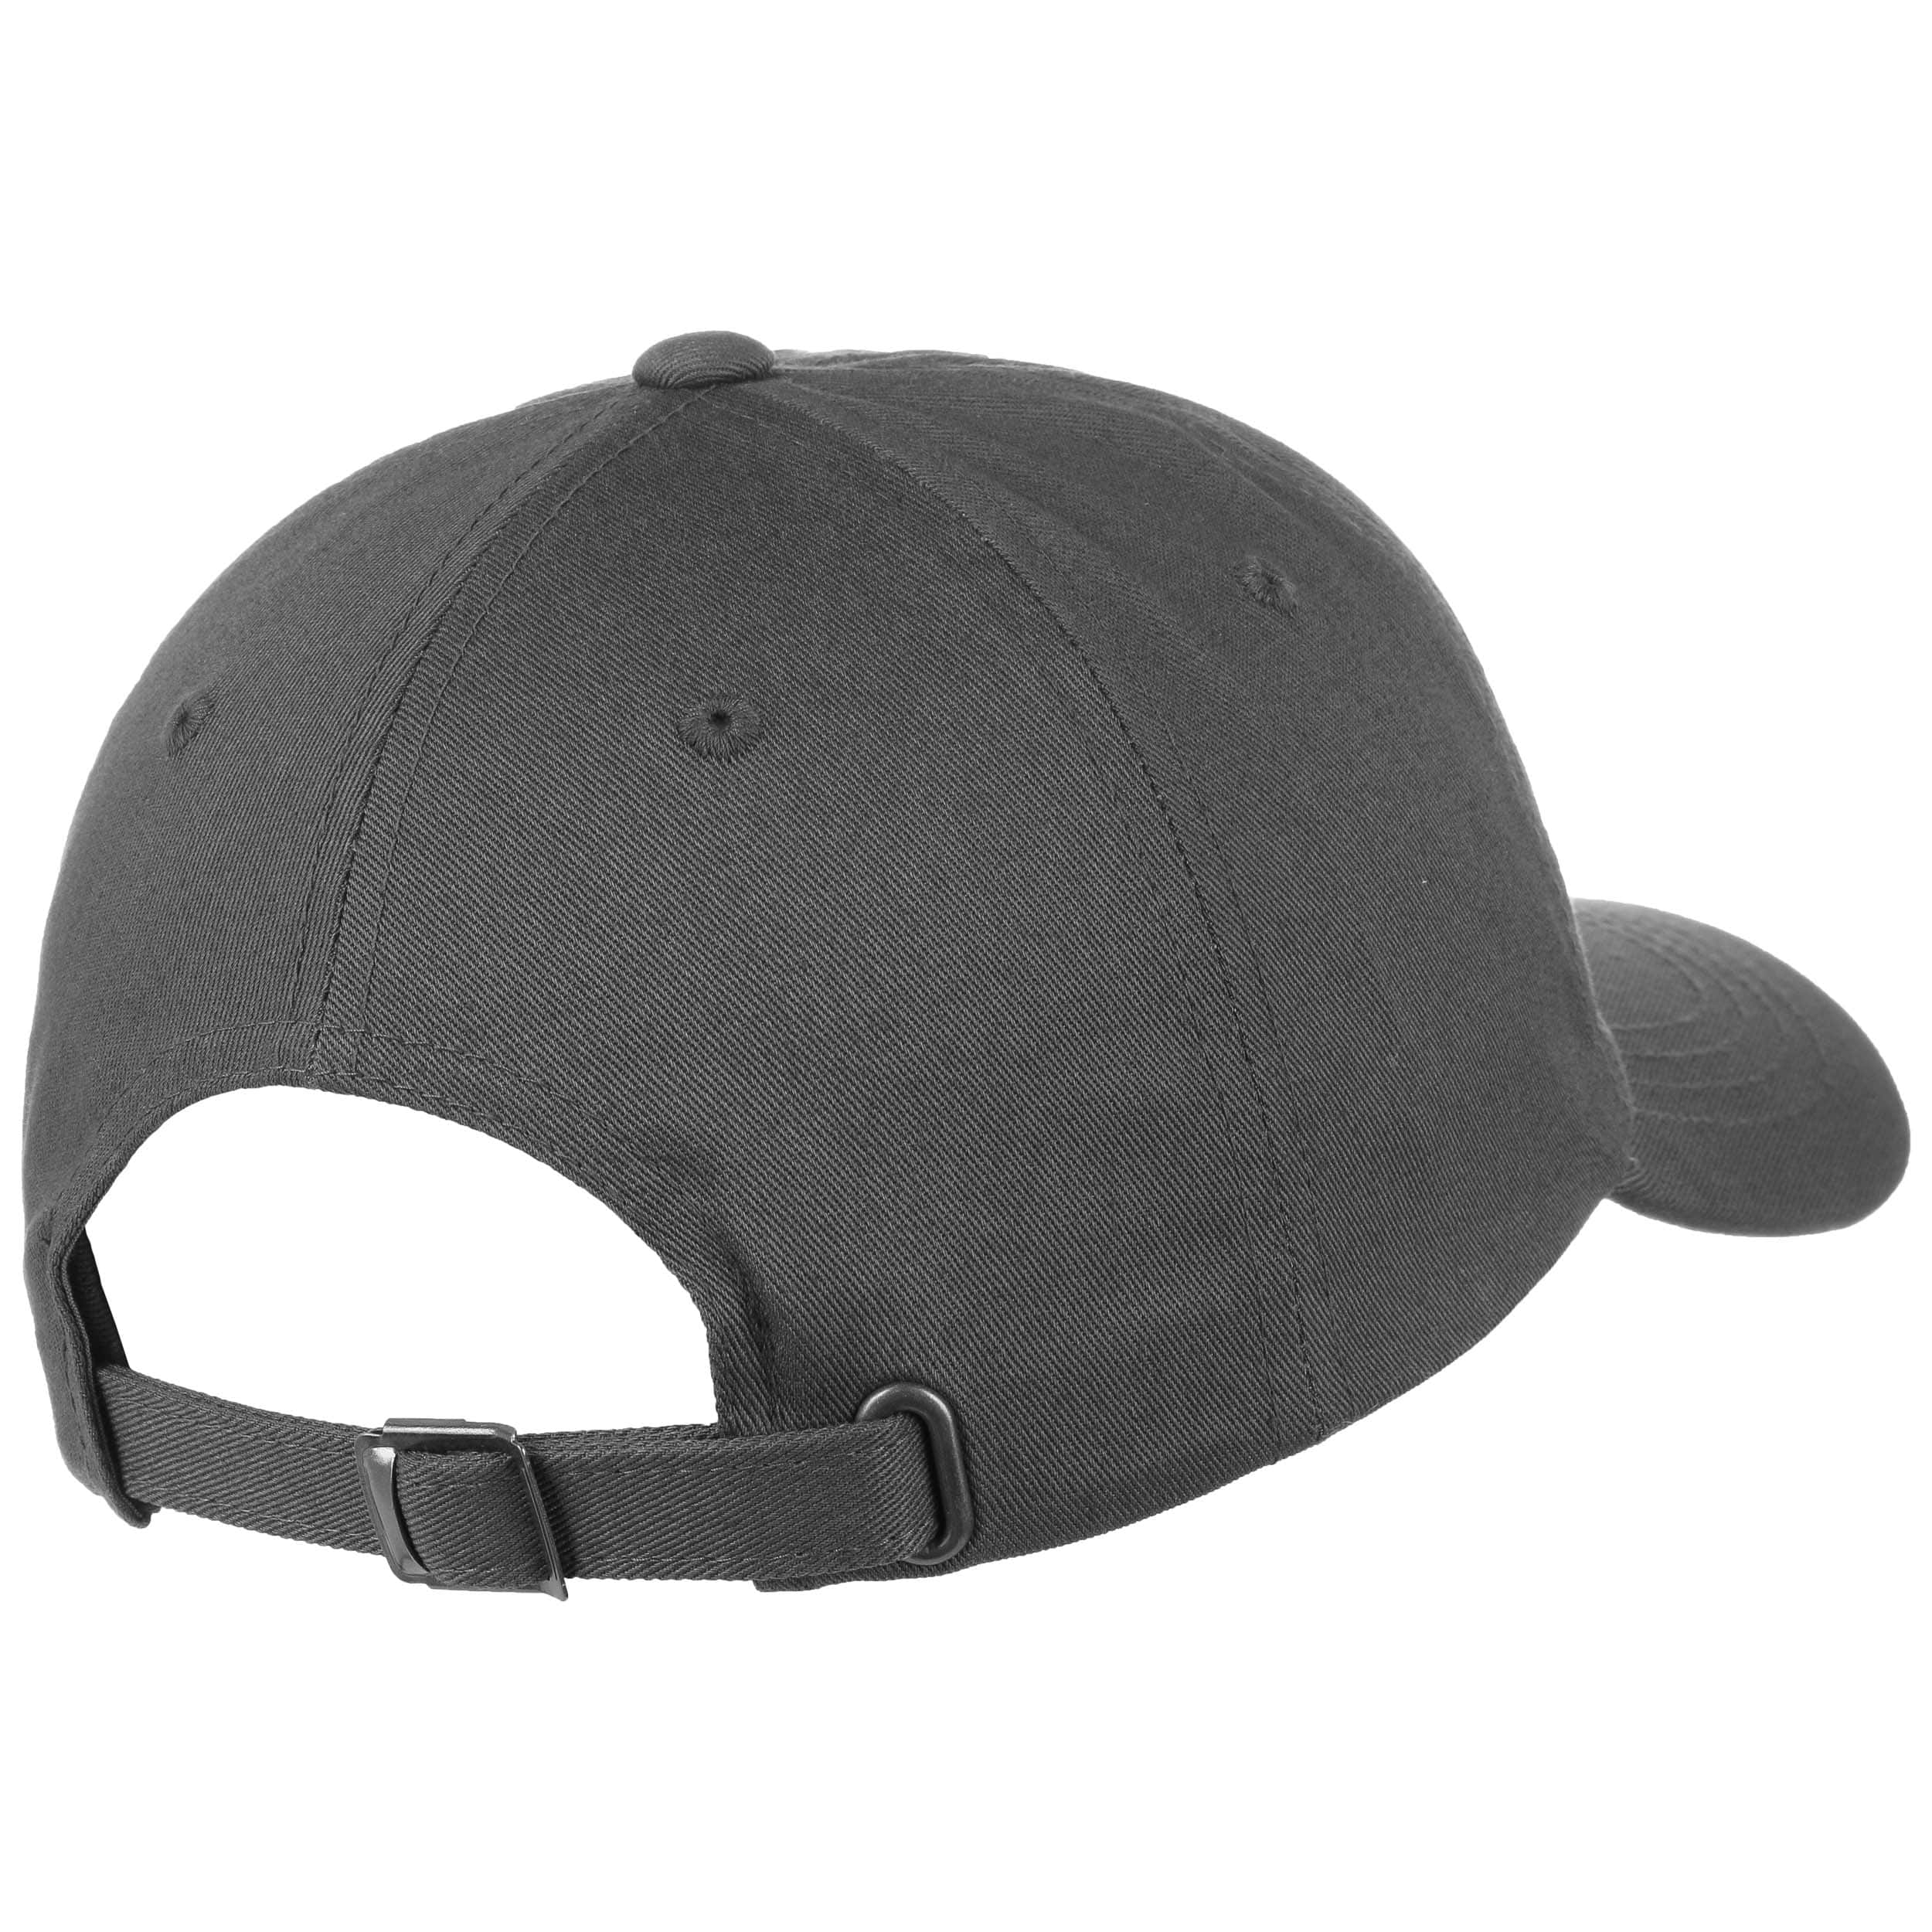 ... Low Profile Cotton Strapback Cap - dark grey 3 ... 44a22fab402